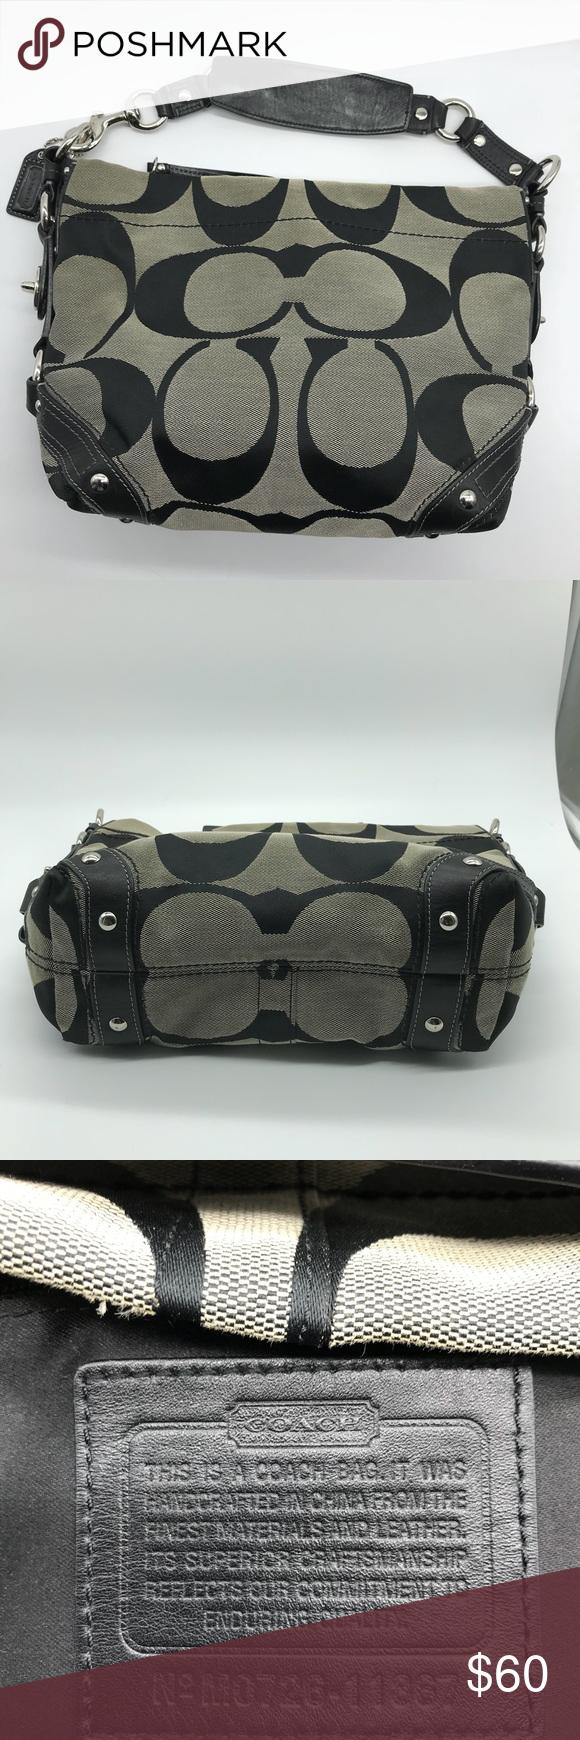 Coach Carly Signature Jacquard Handbag   Smoke free, Coach bags and ... cff838b873